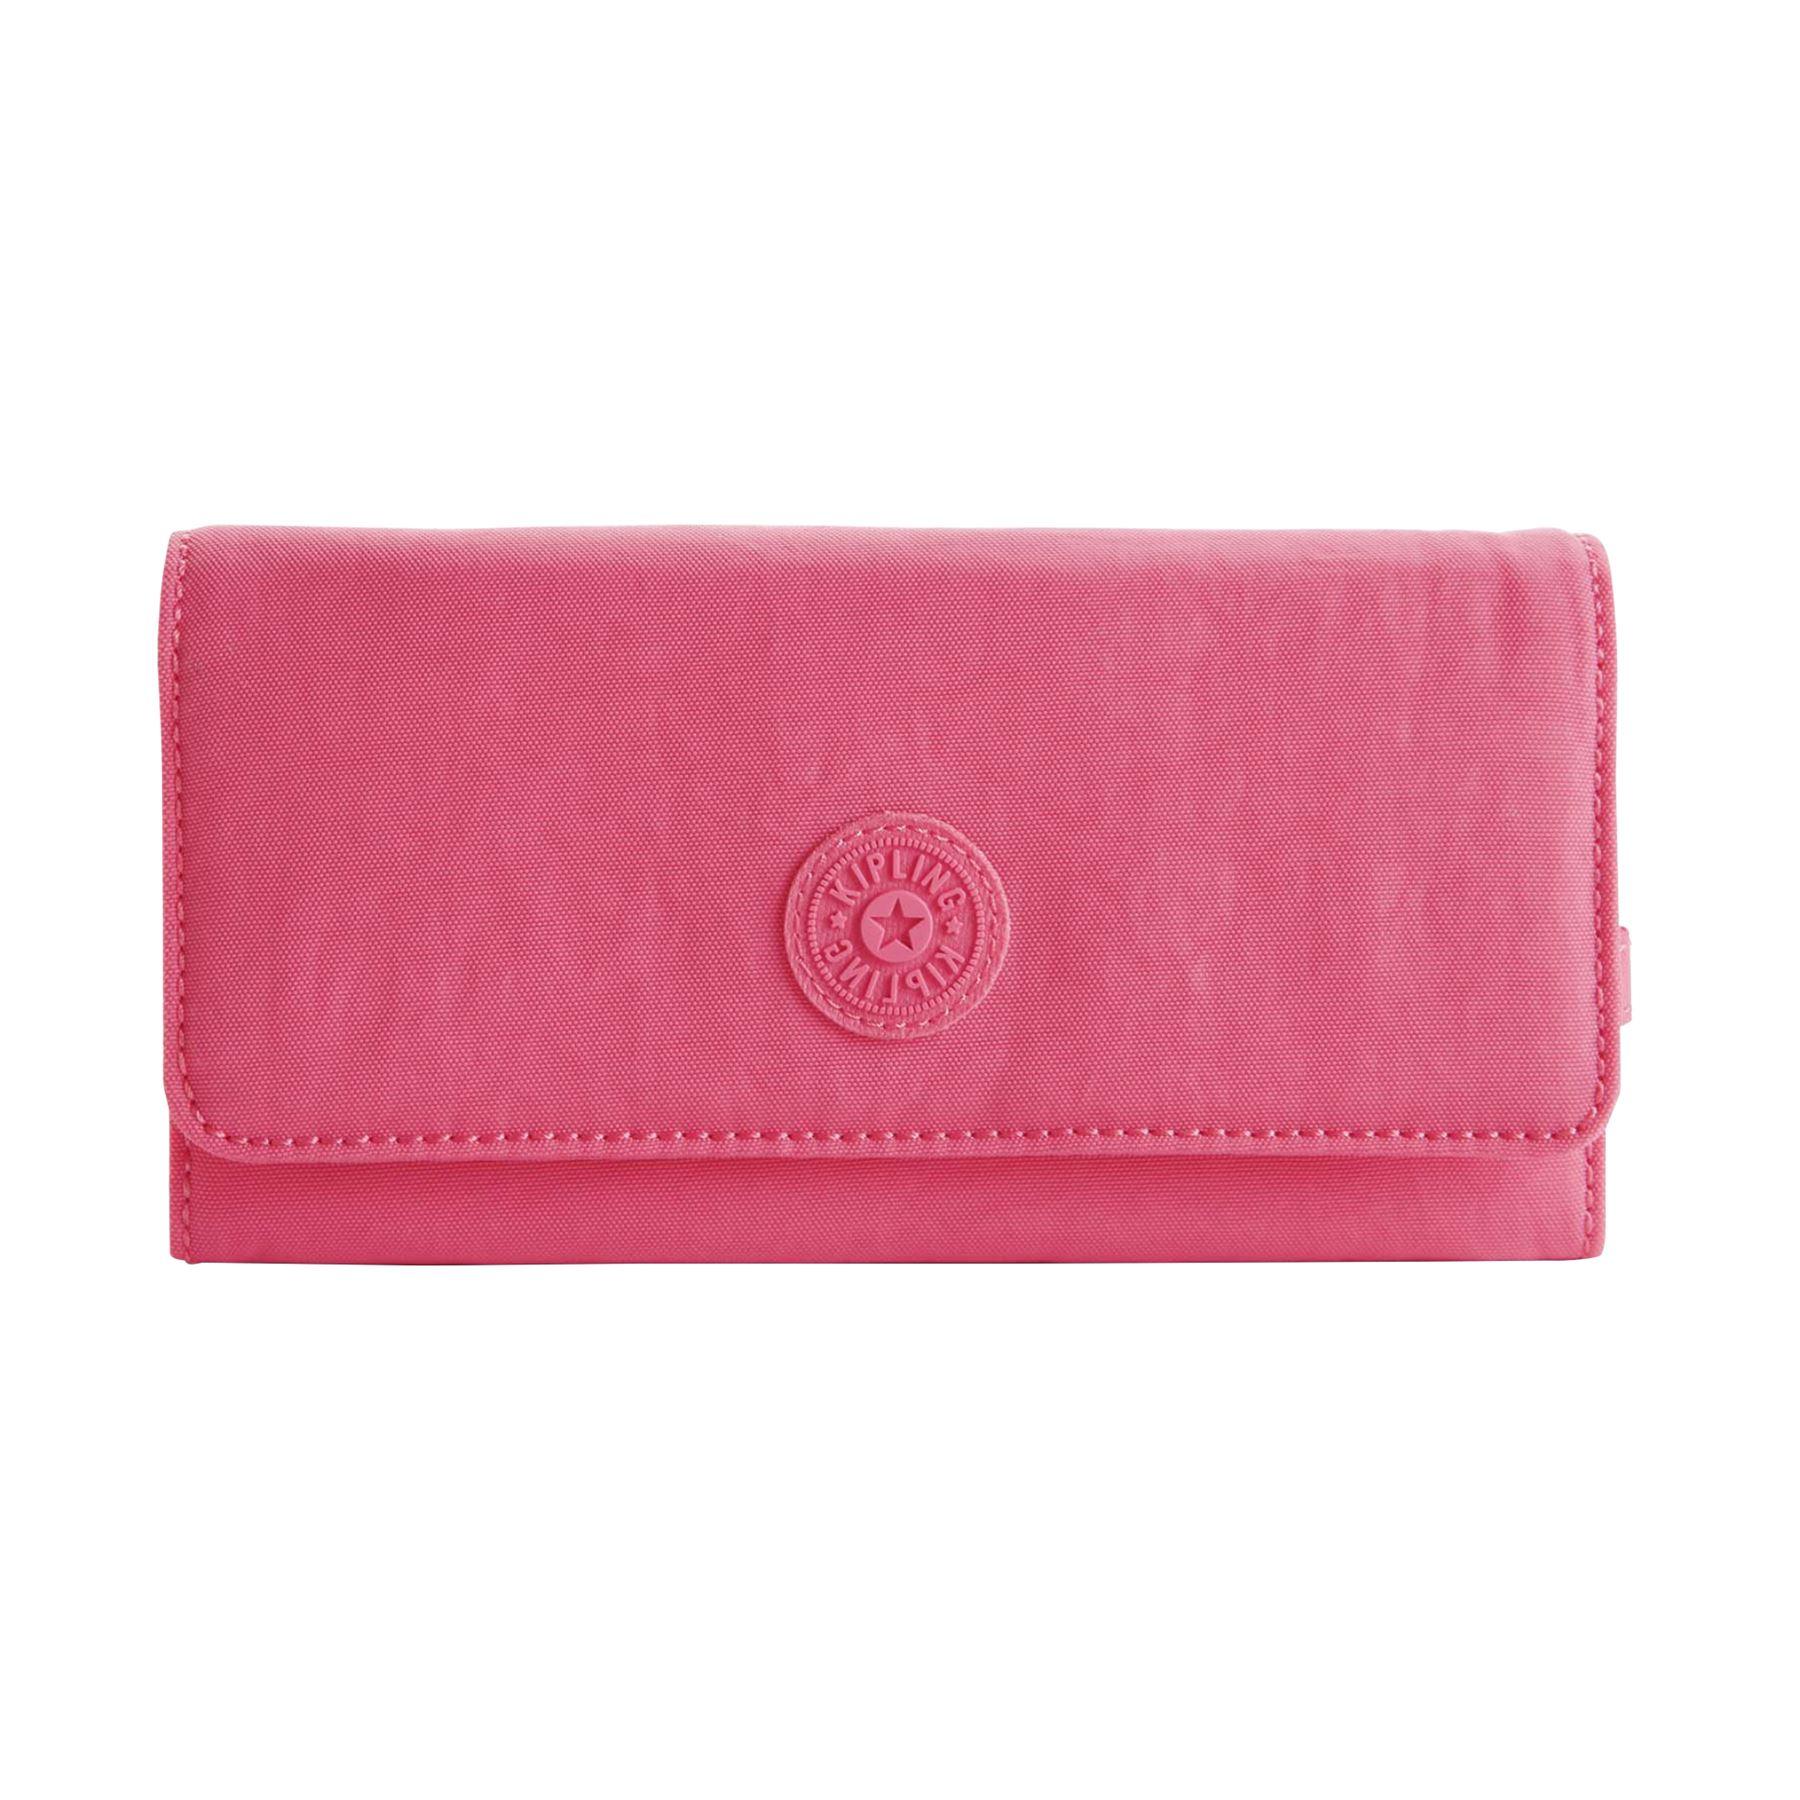 Kipling-Brownie-Tri-Fold-Women-039-s-Ladies-Purse-Wallet-2018-Colours